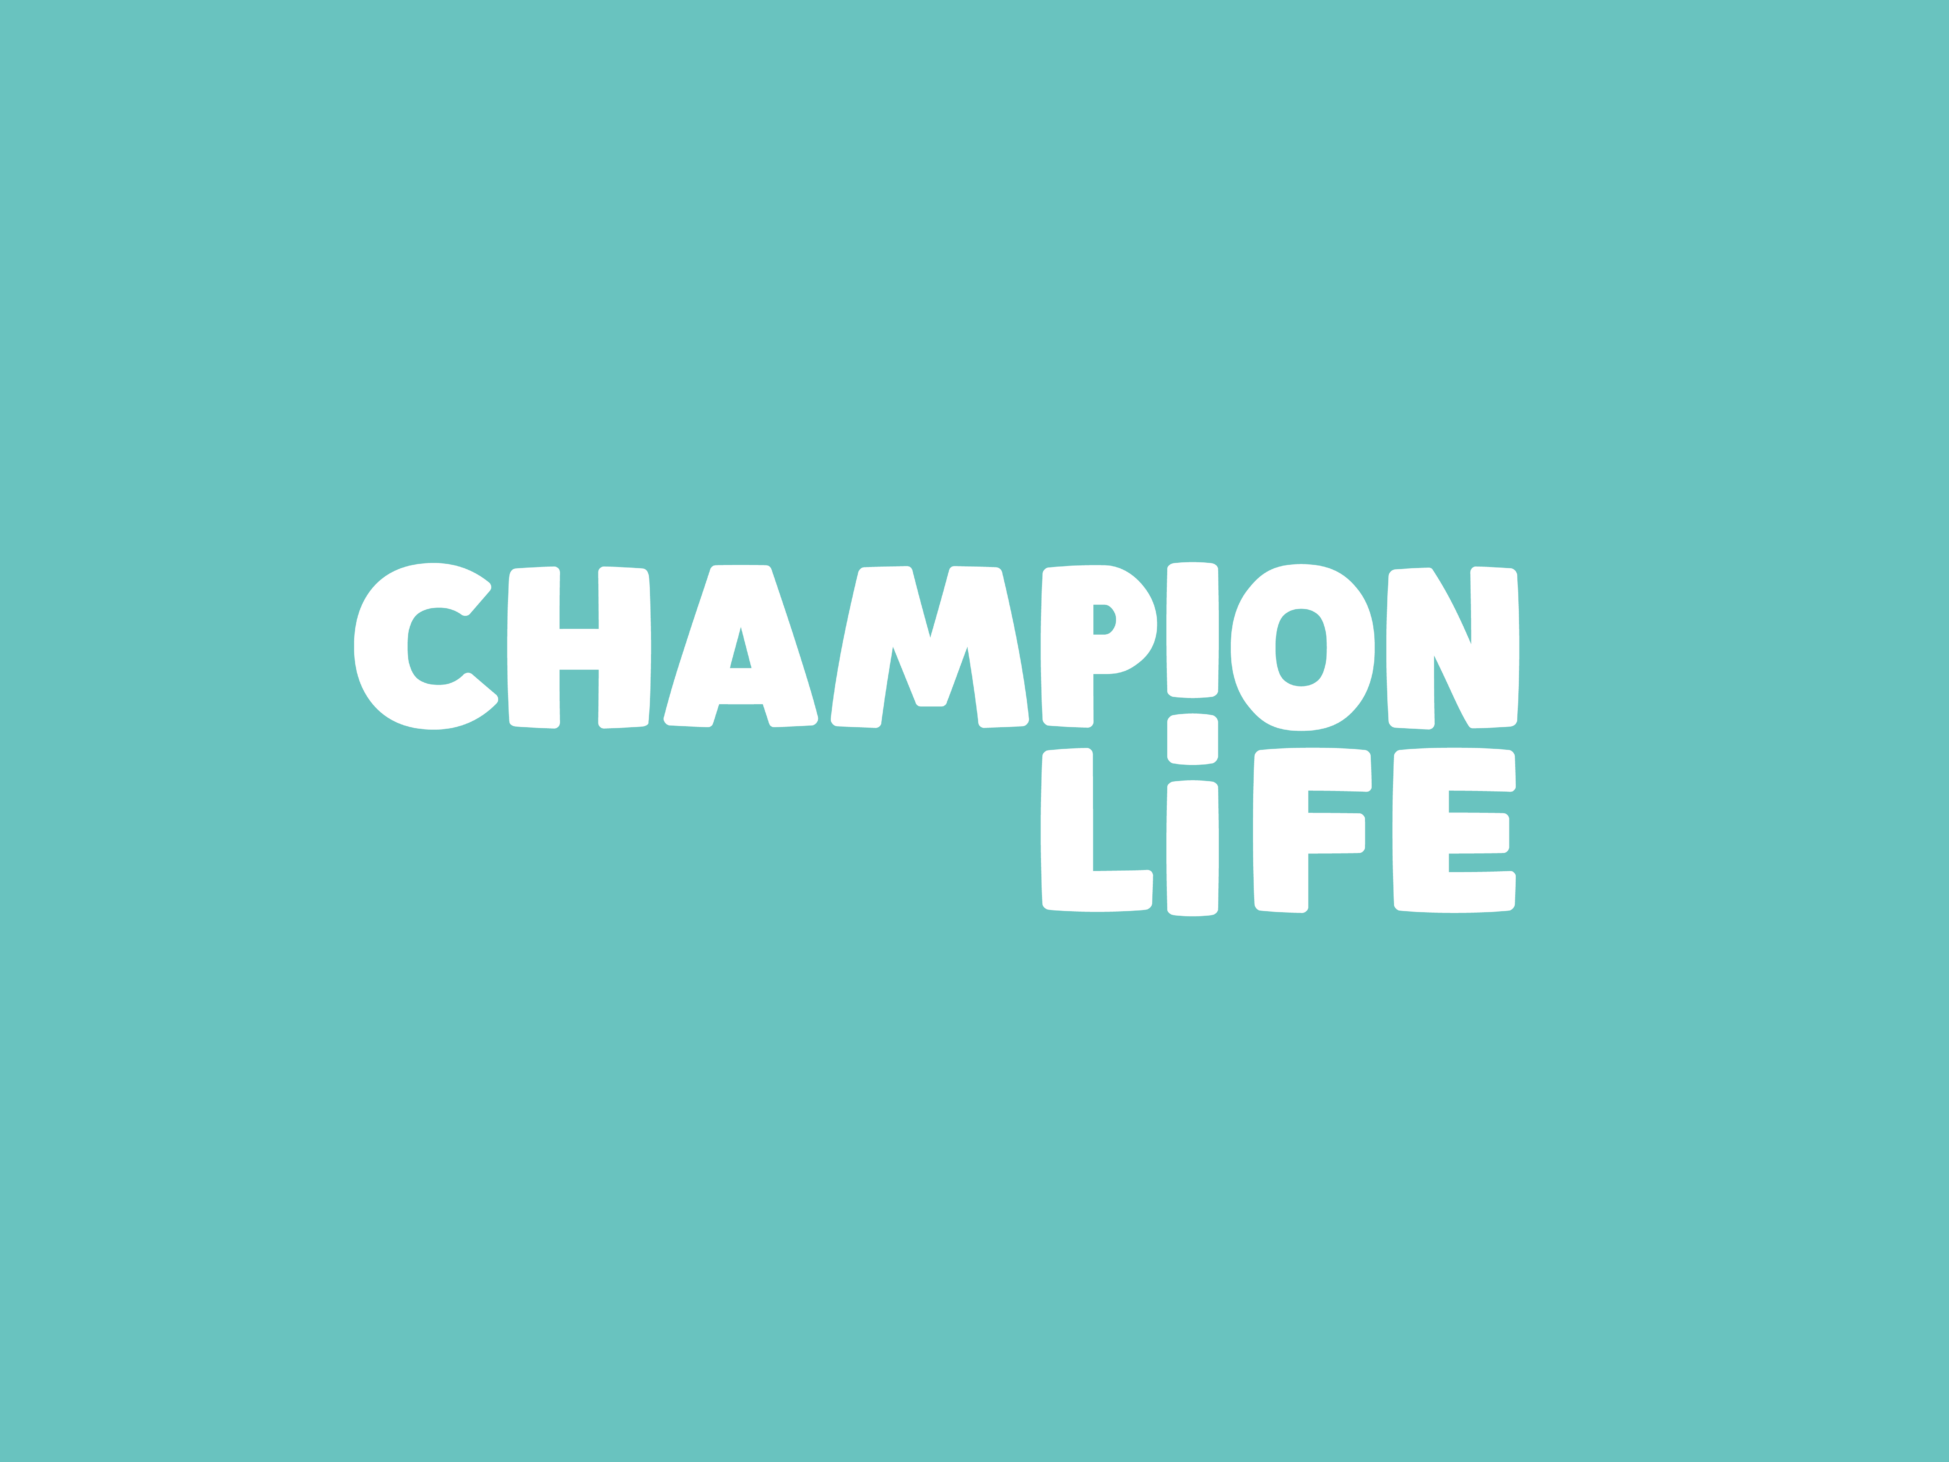 Champion Life logo